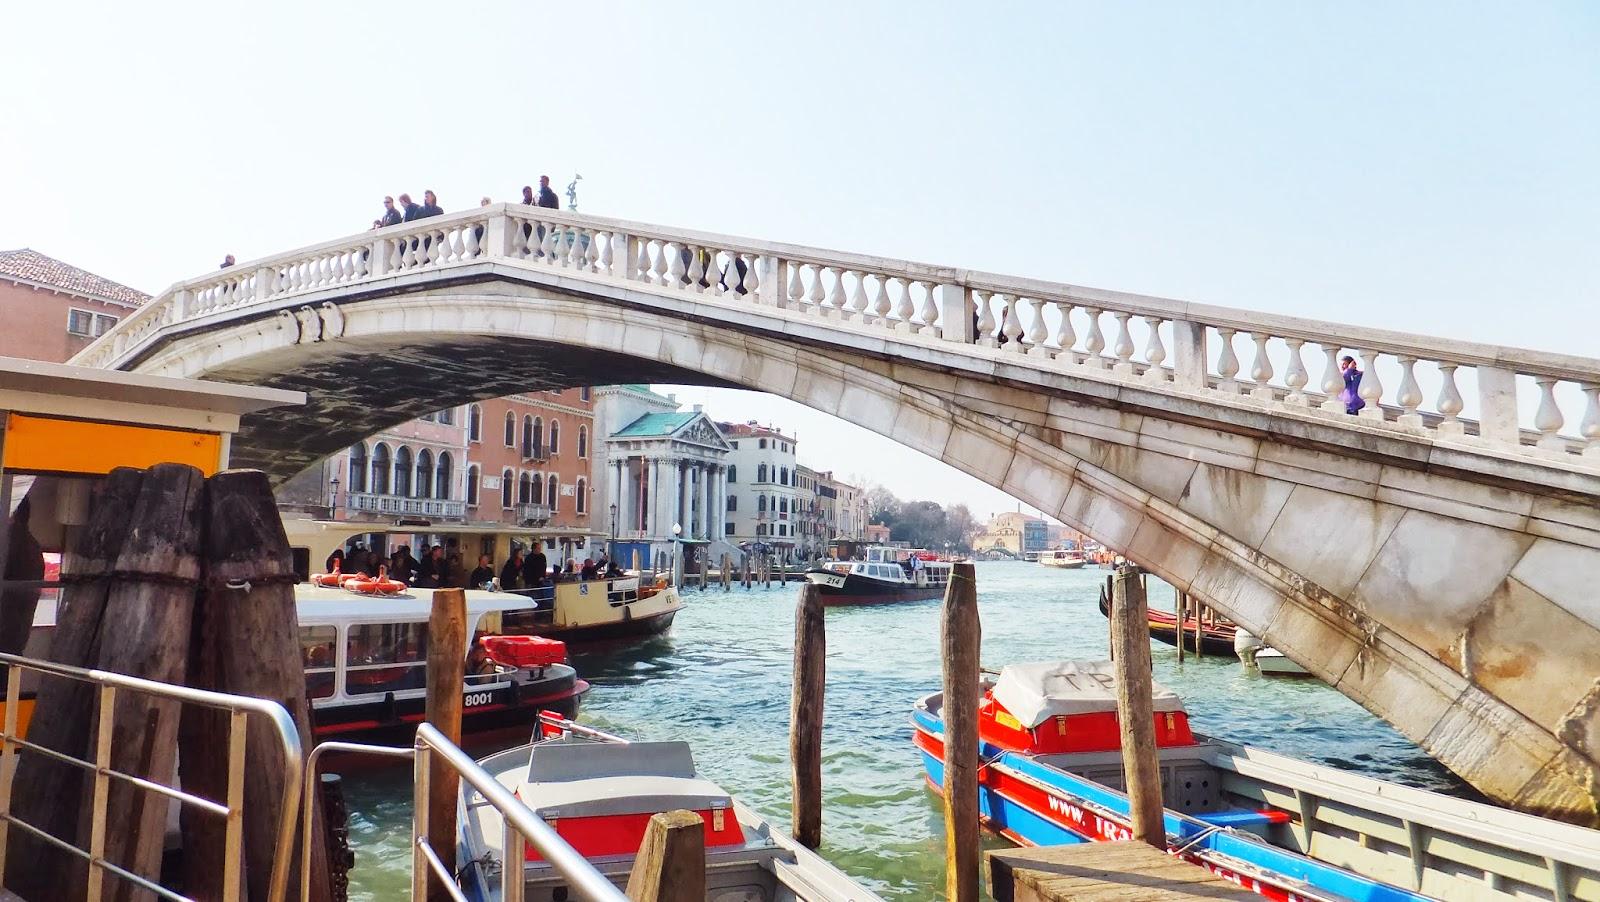 Ponte degli Scalzi, Venecia, Venezia, Italia, Elisa N, Blog de Viajes, Lifestyle, Travel